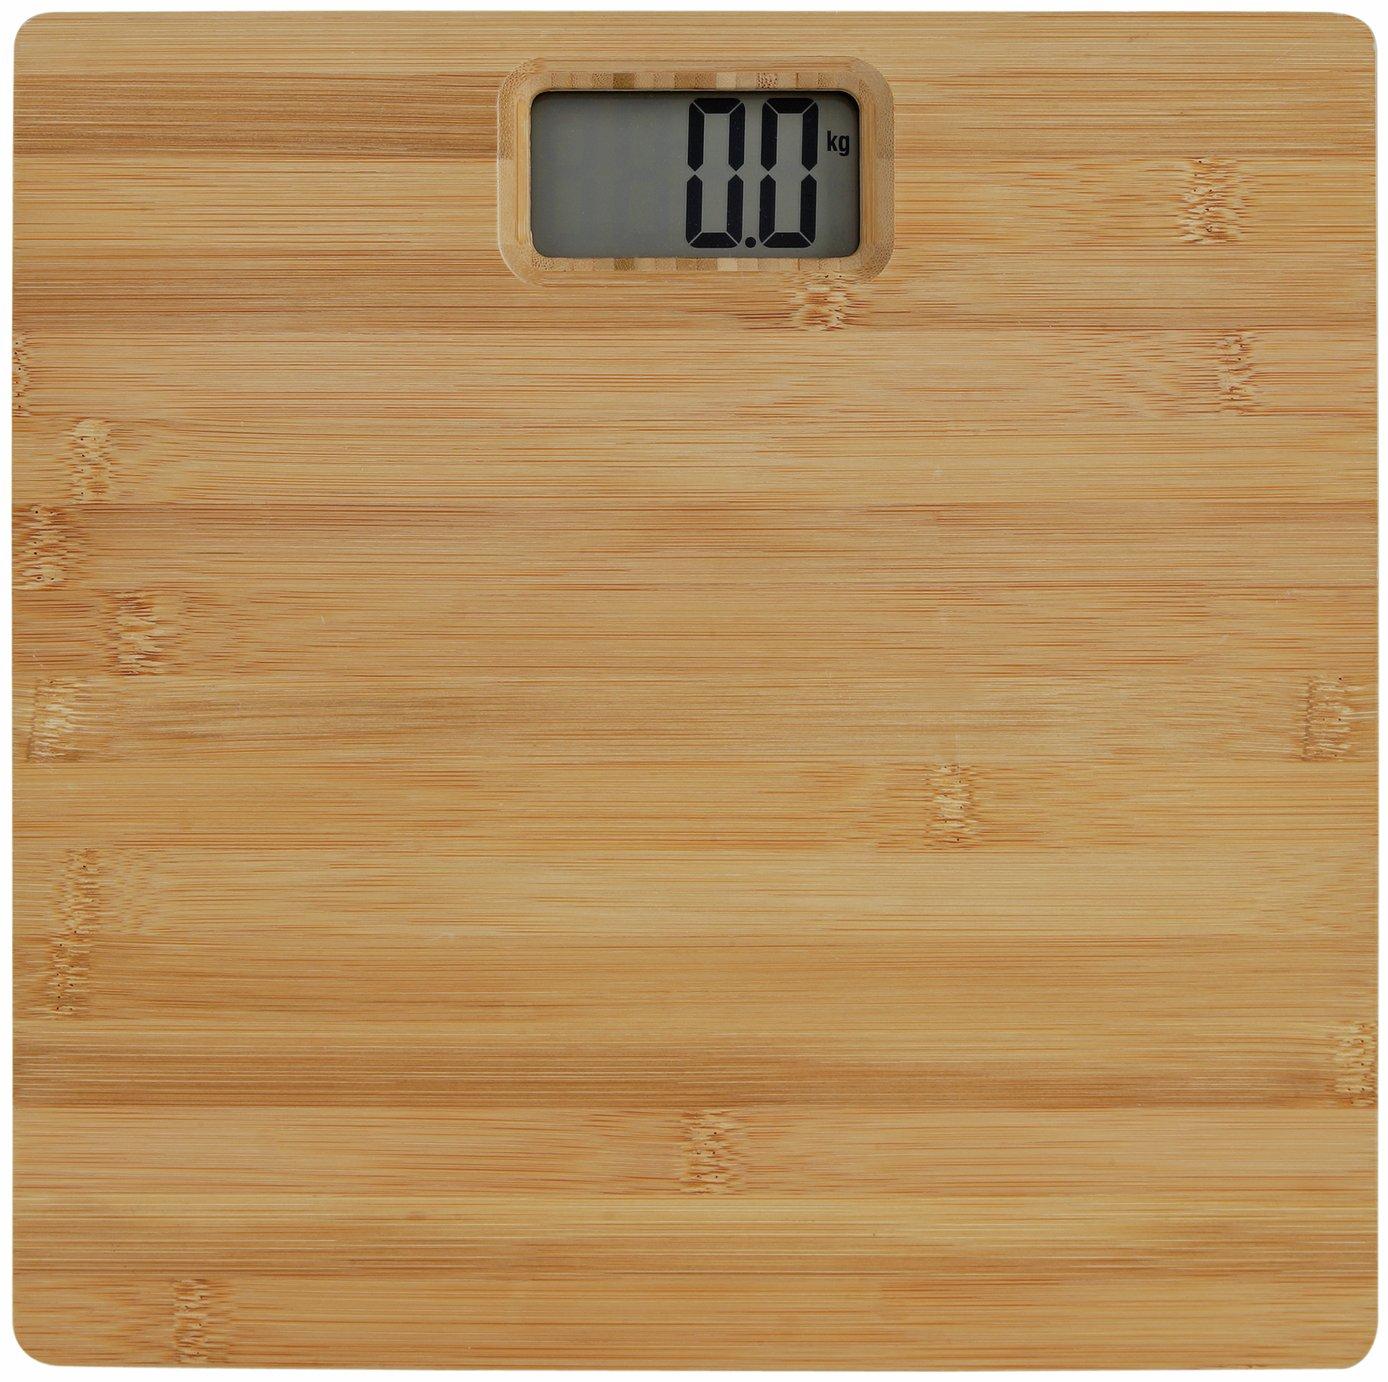 Argos Home Bamboo Digital Bathroom Scales